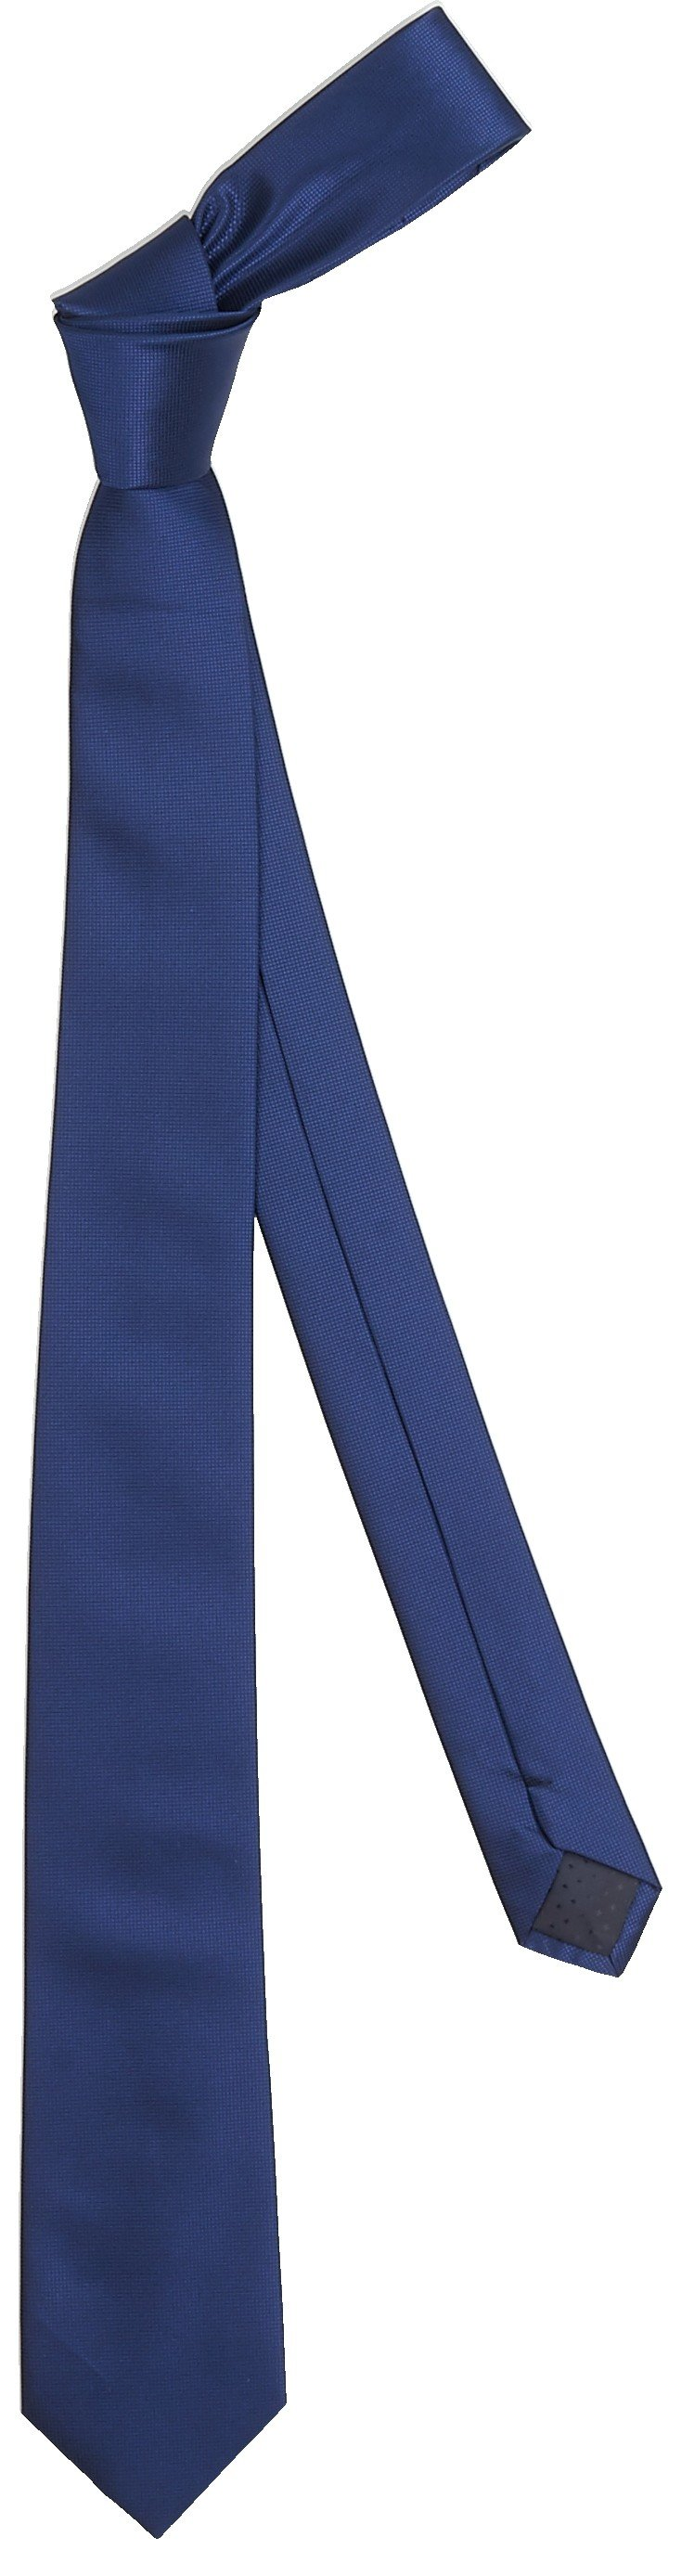 Галстук мужской, 1540x70 мм, тёмно-синий